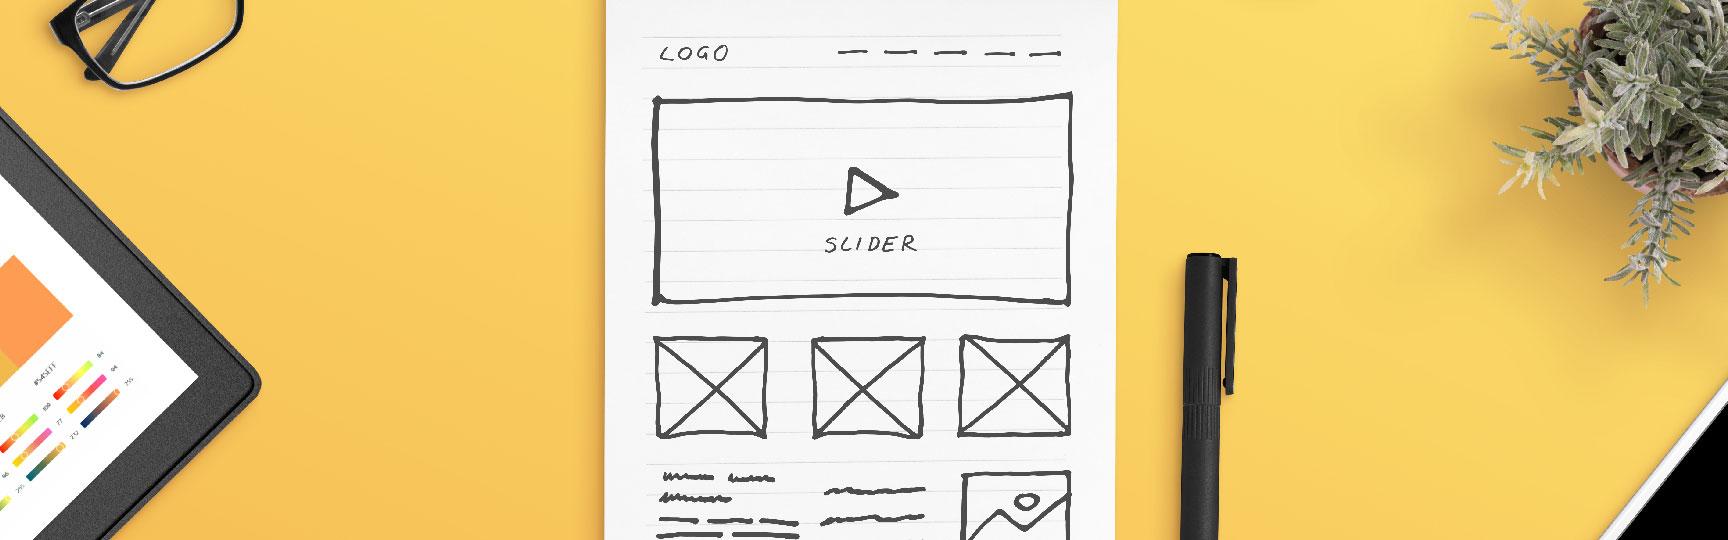 How To Start A Killer Website From Scratch